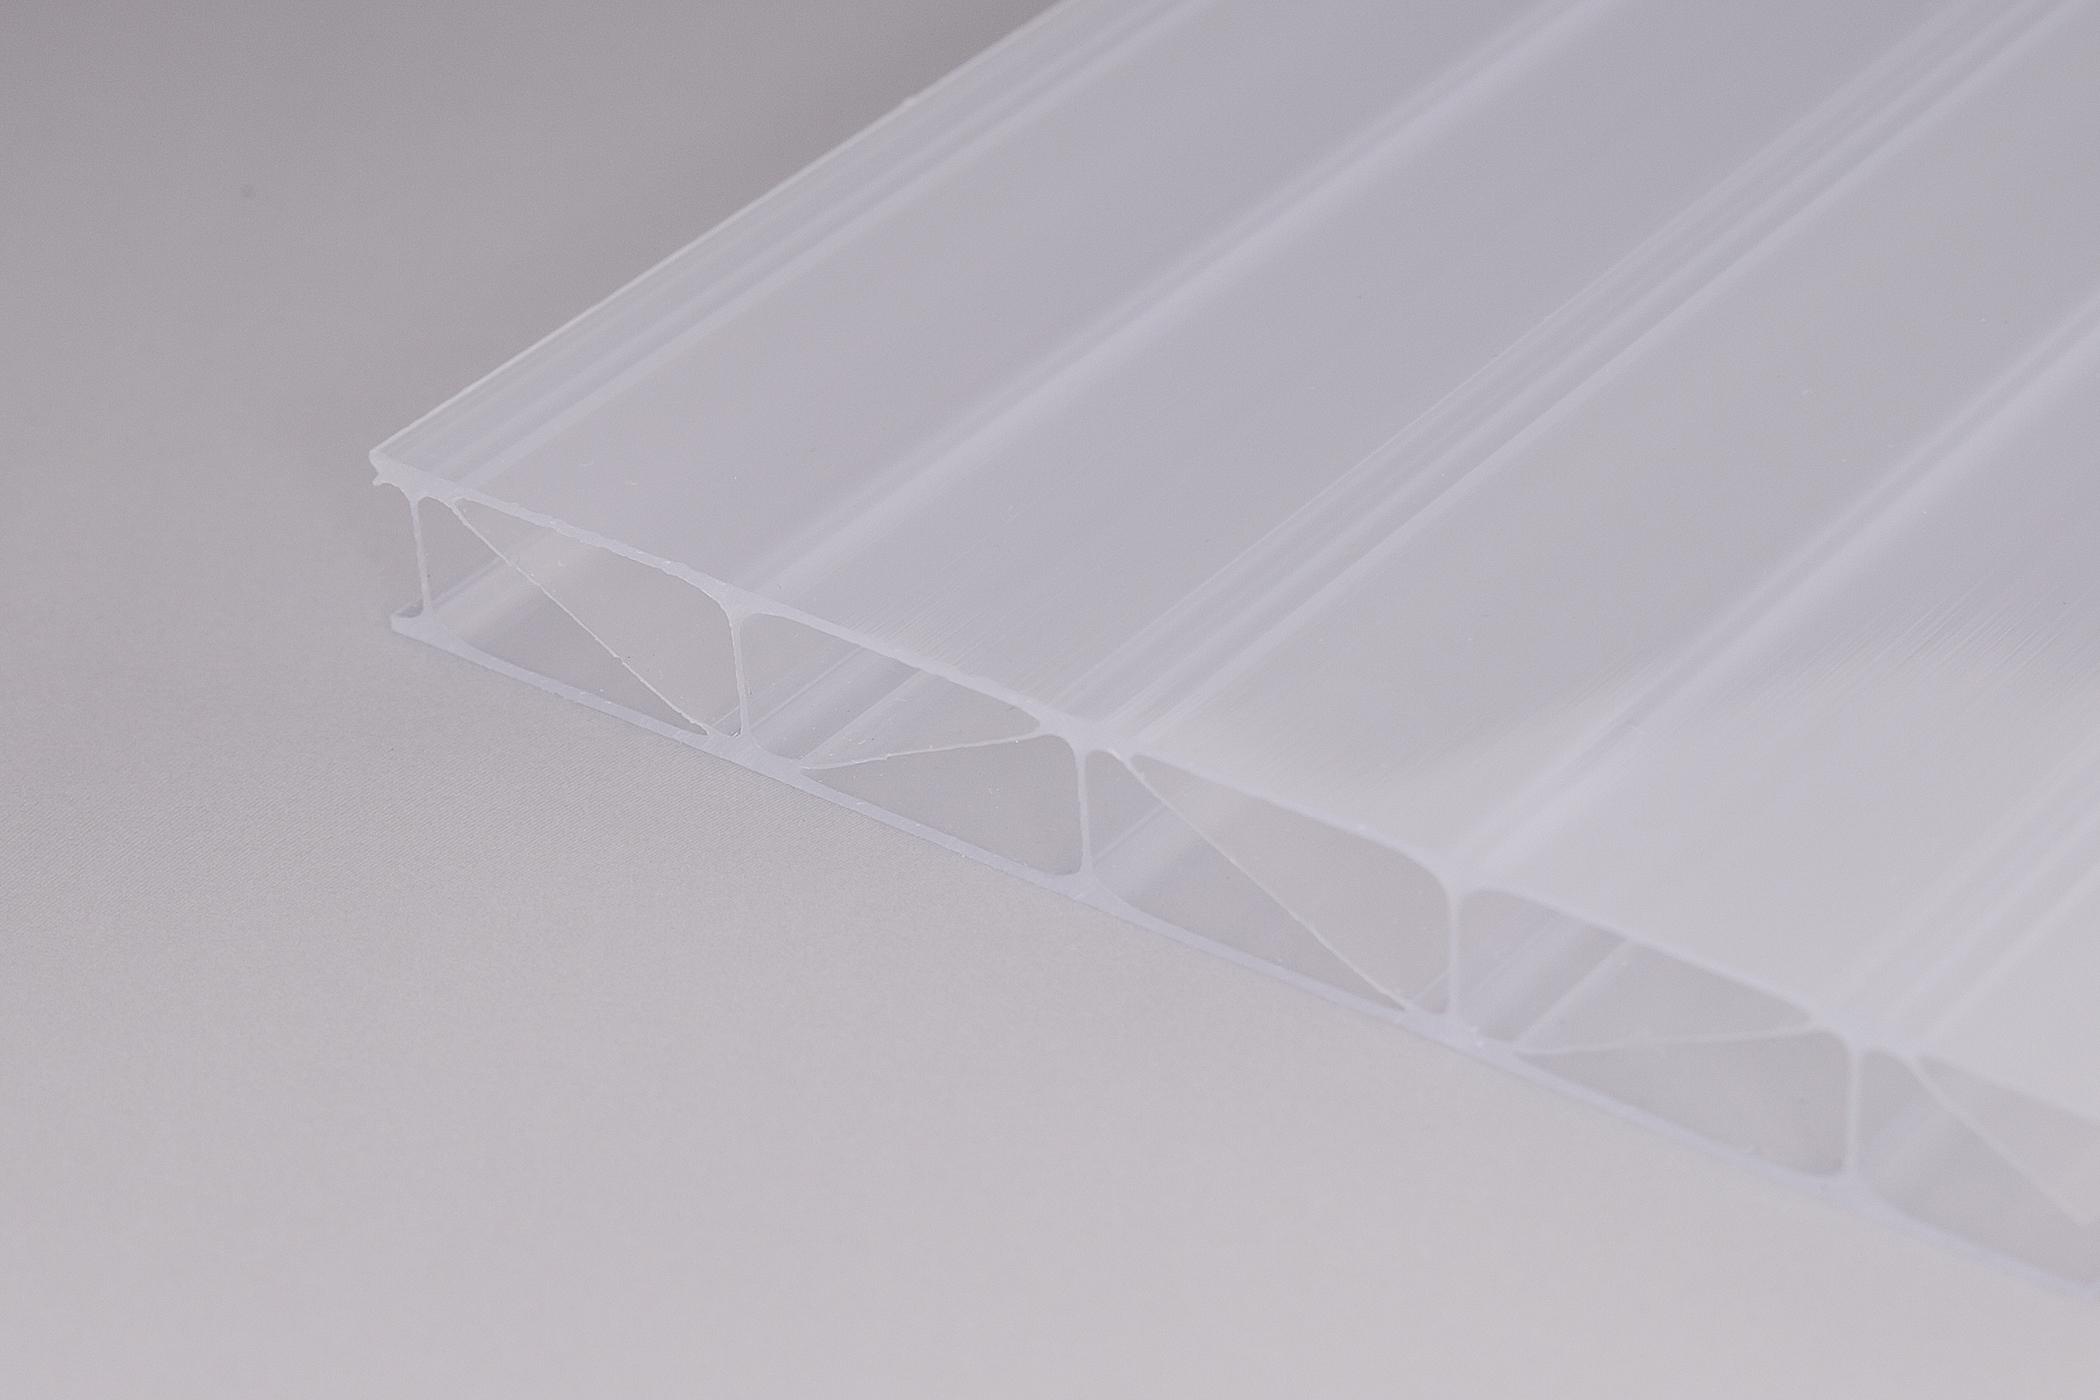 16mm stegplatten polycarbonat marlon premium longlife wei opal hagelsicher bernd fitschen gnbr. Black Bedroom Furniture Sets. Home Design Ideas